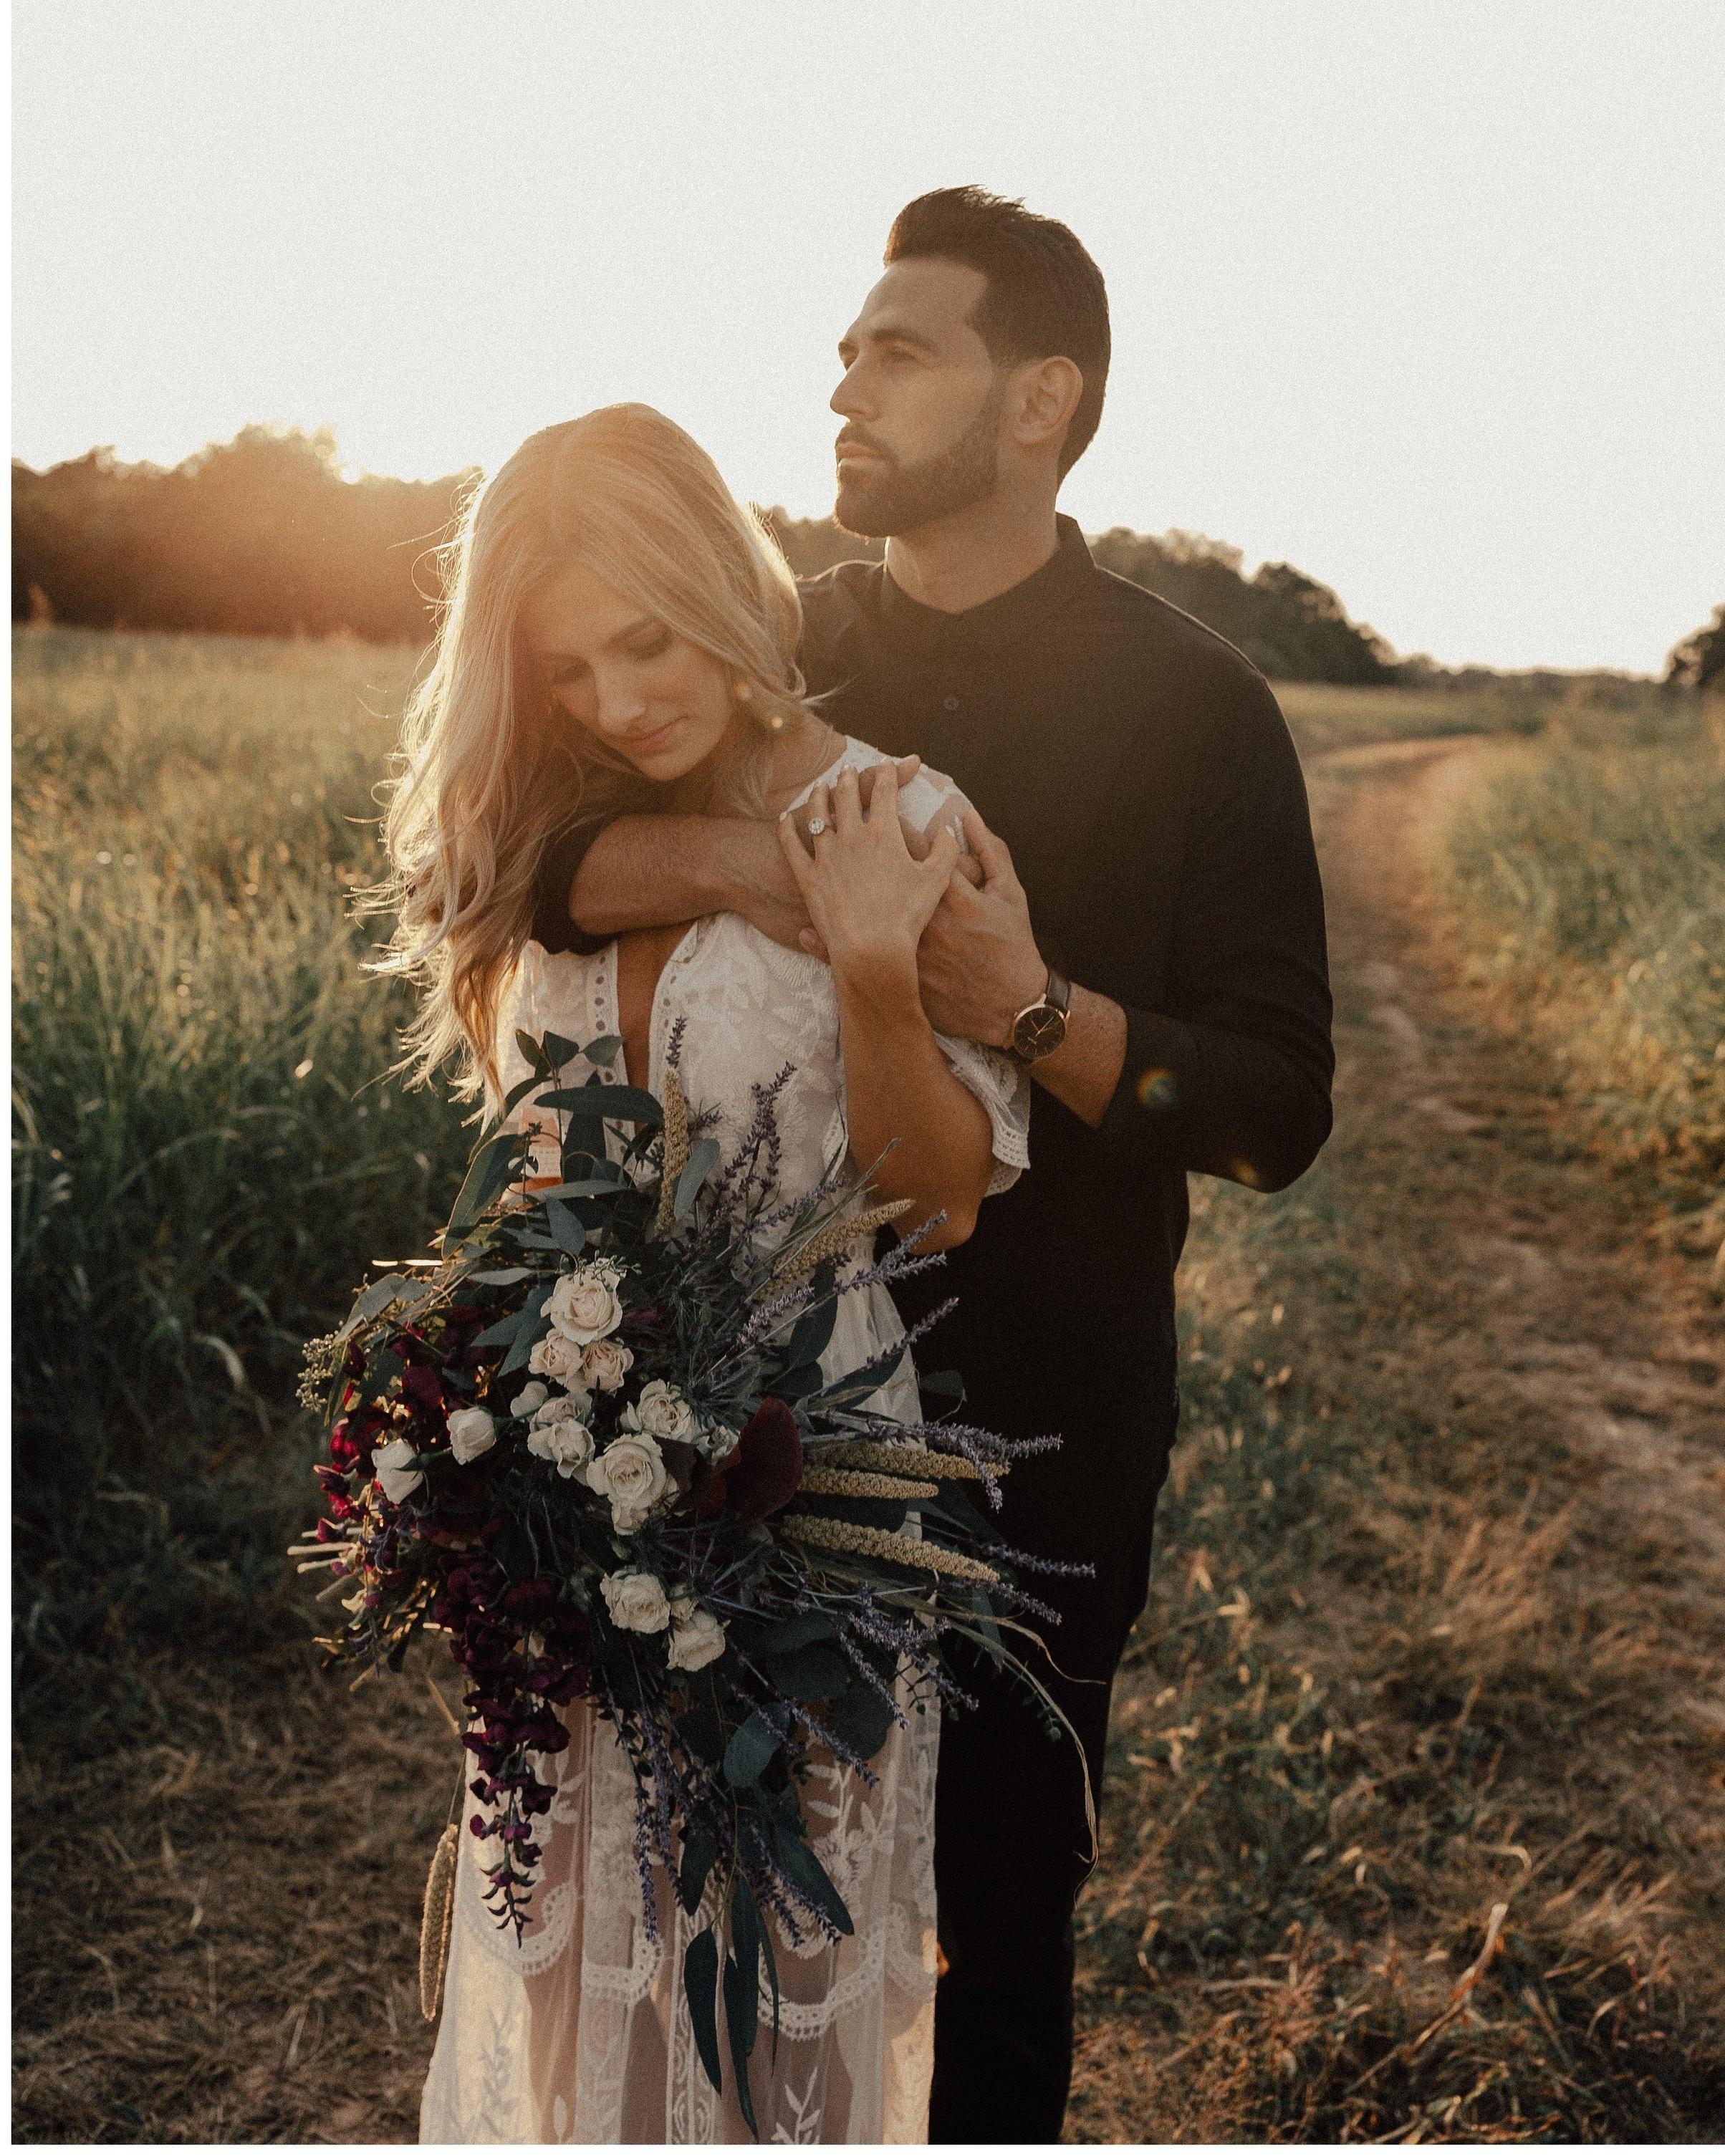 intimate + elopement + california + oregon + arkansas + oklahoma + texas + north carolina photographer